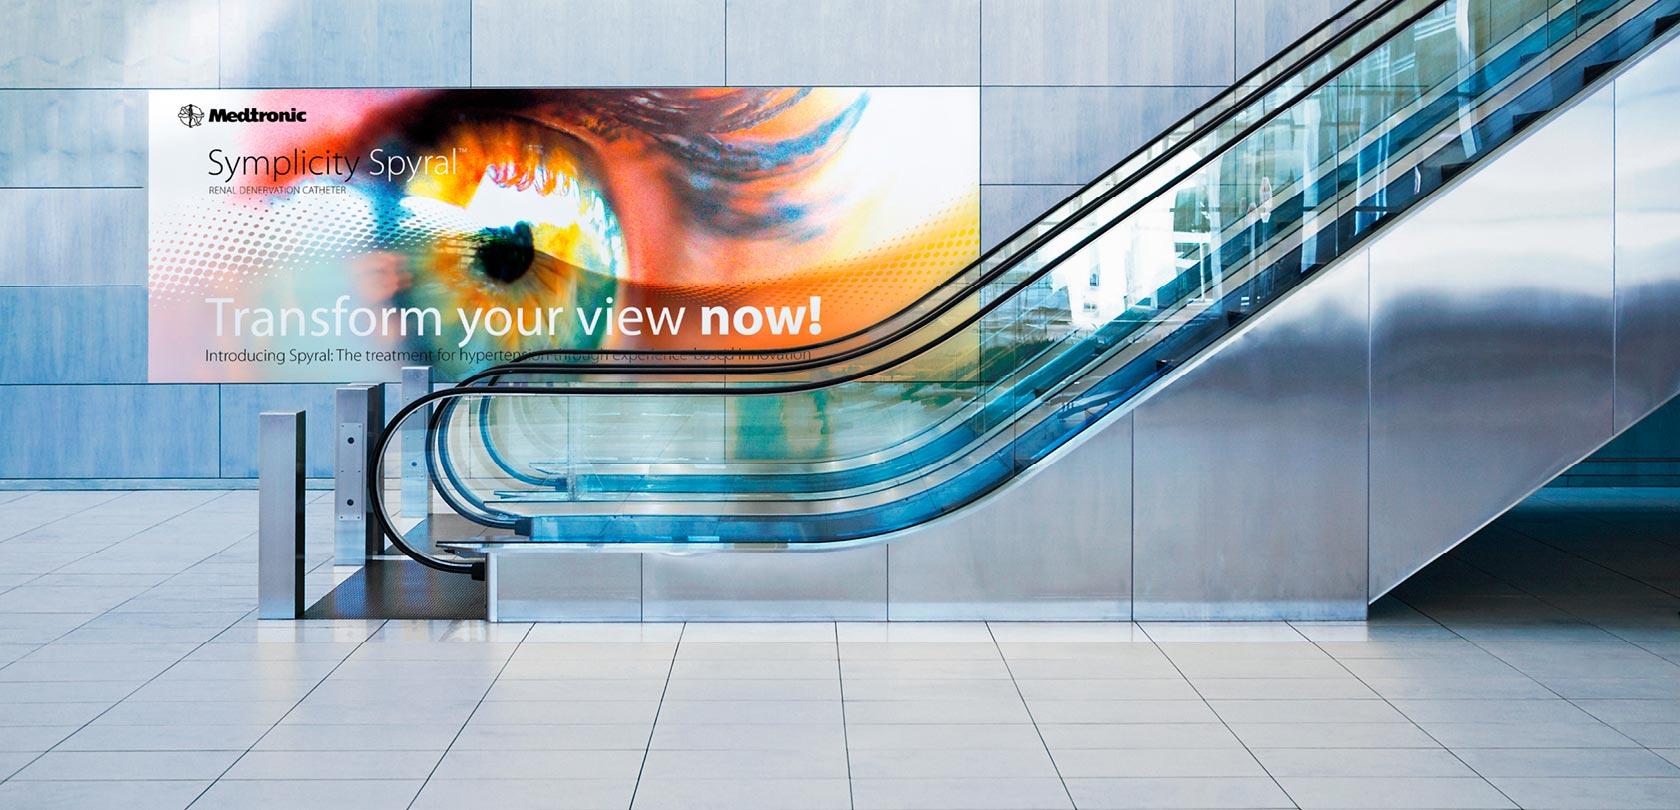 Medtronic campagne - design: ontwerpbureau VA